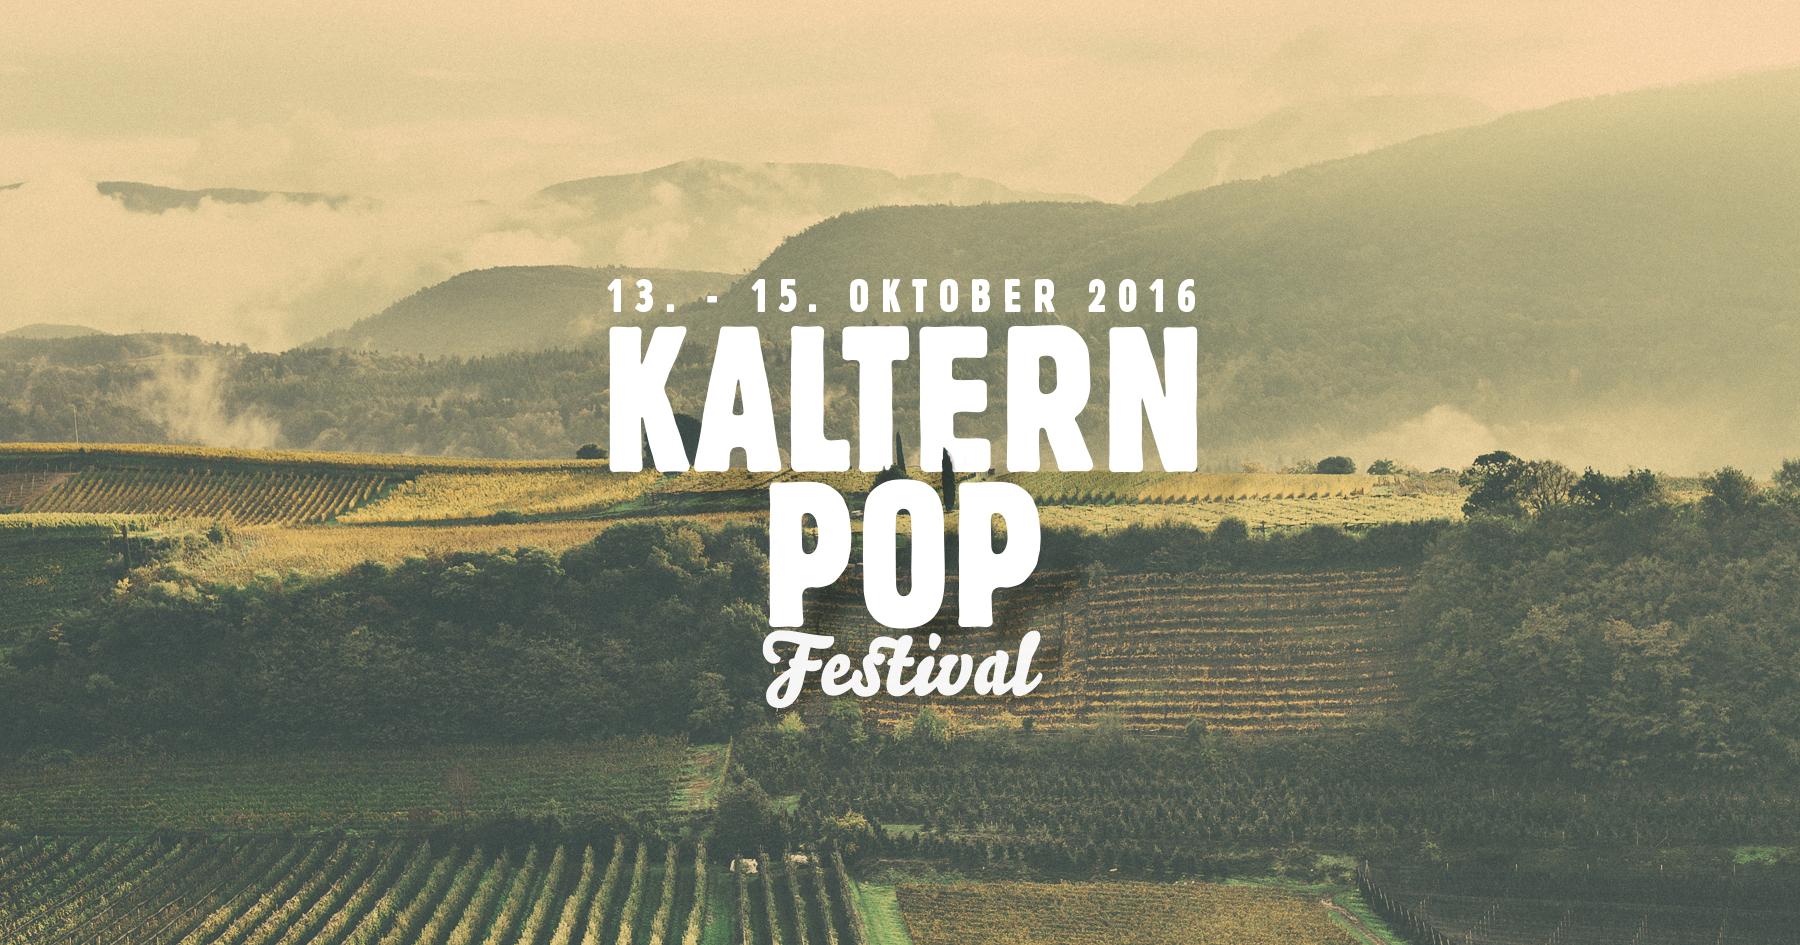 2. KALTERN POP FESTIVAL